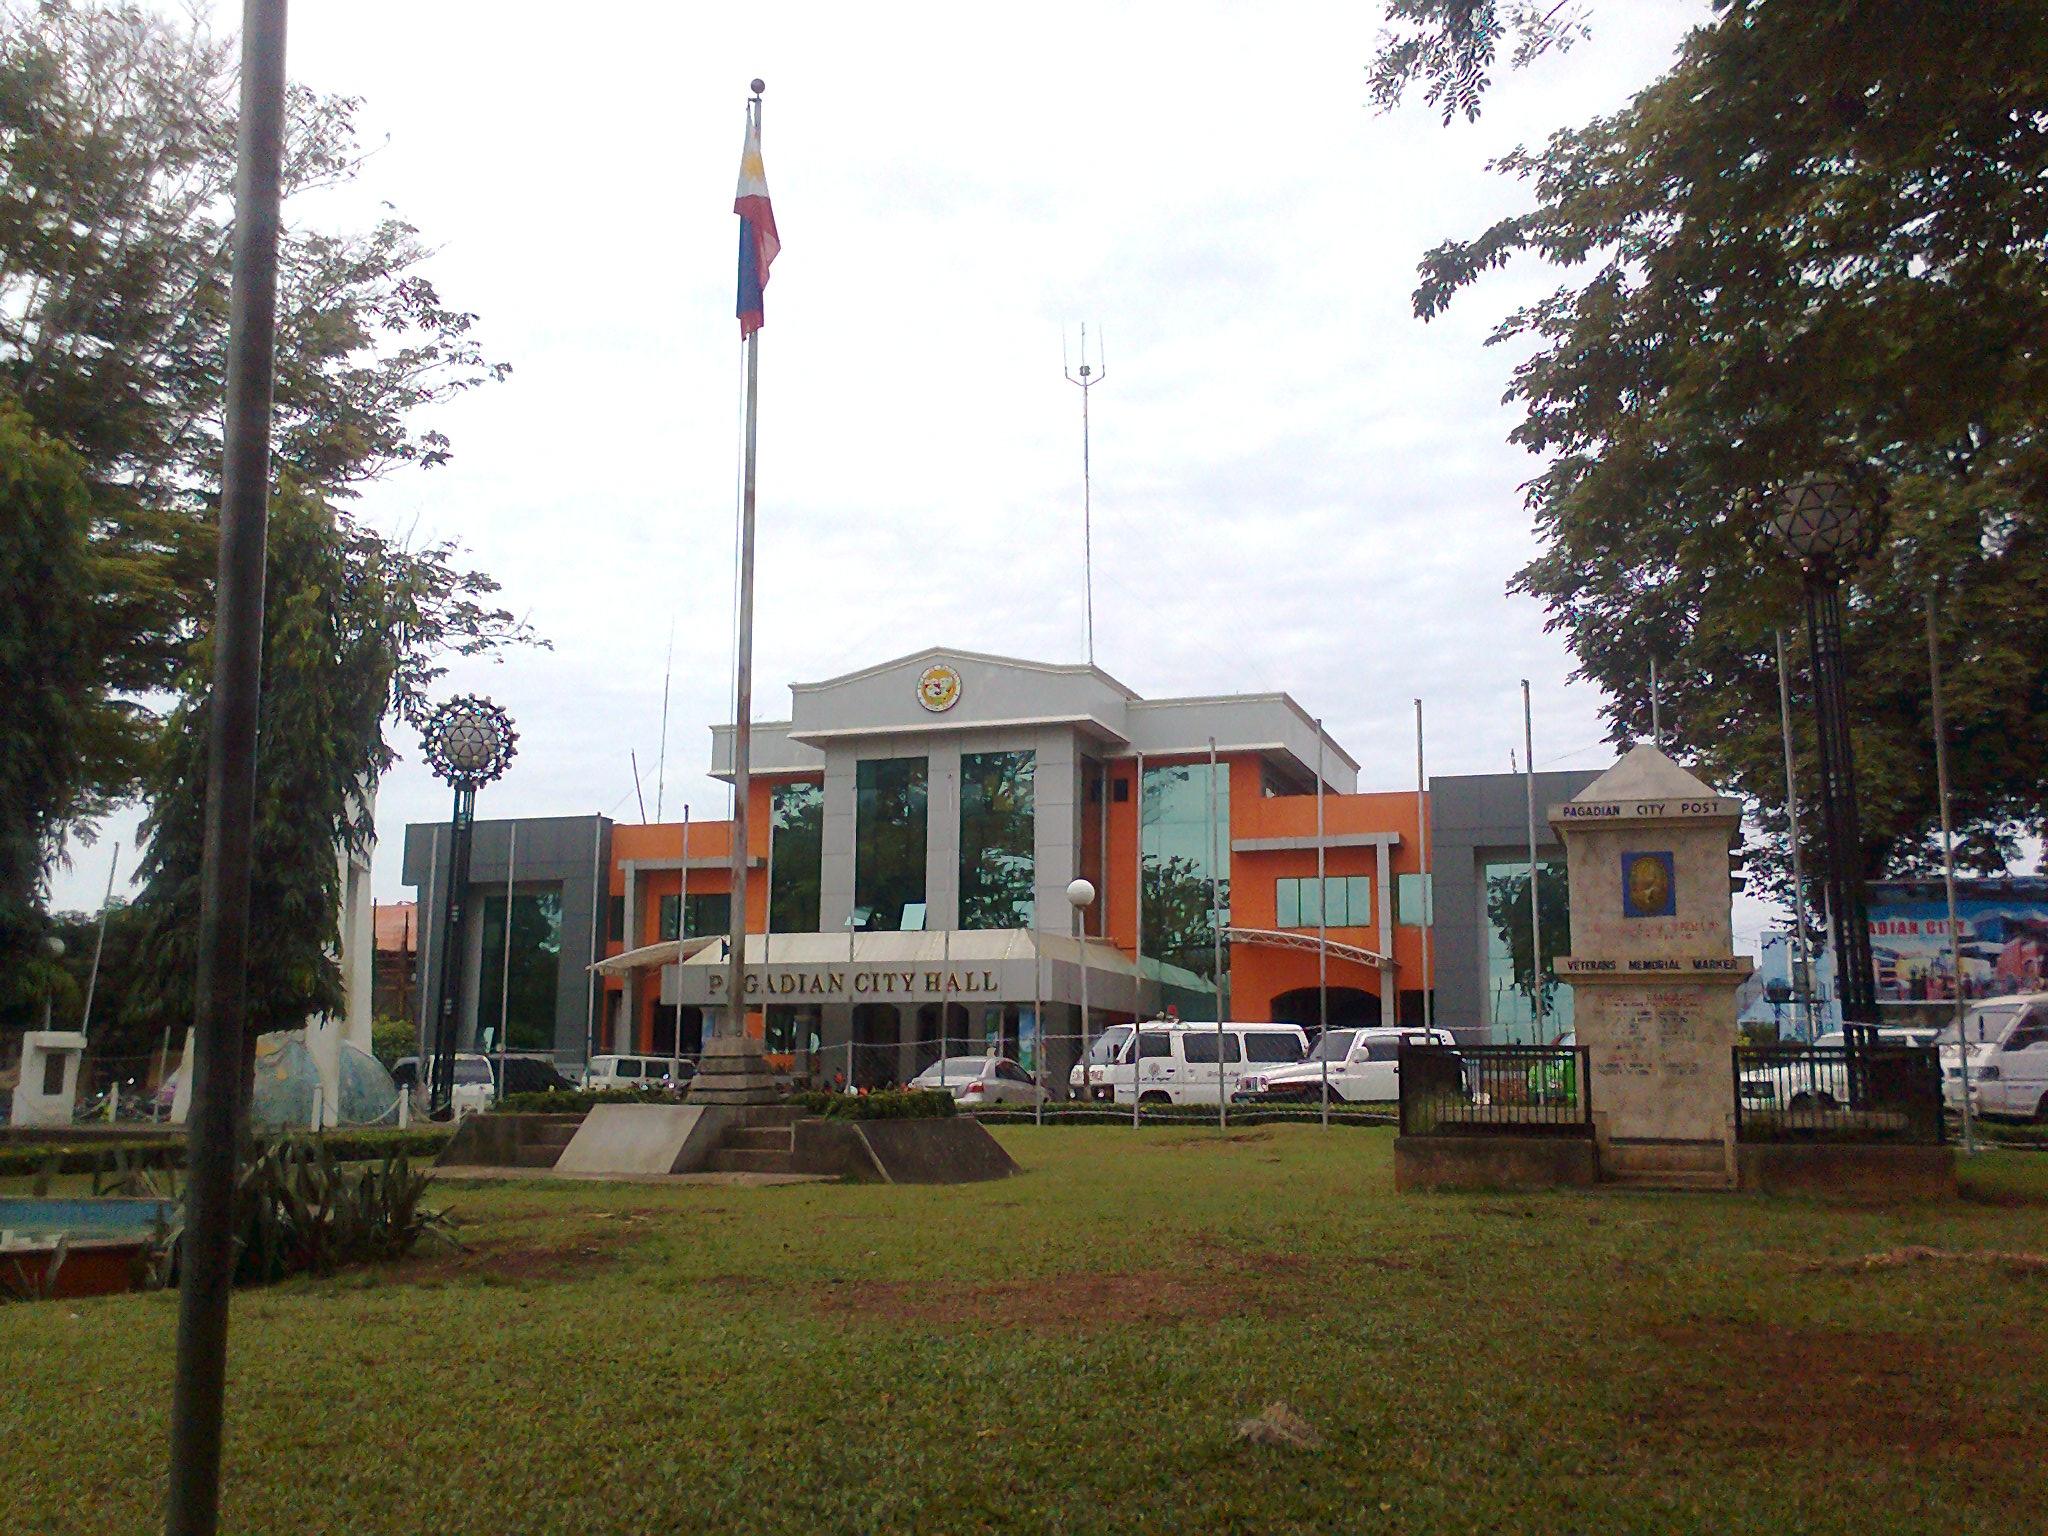 File:Pagadian City Hall in gatas pagadian city zamboanga